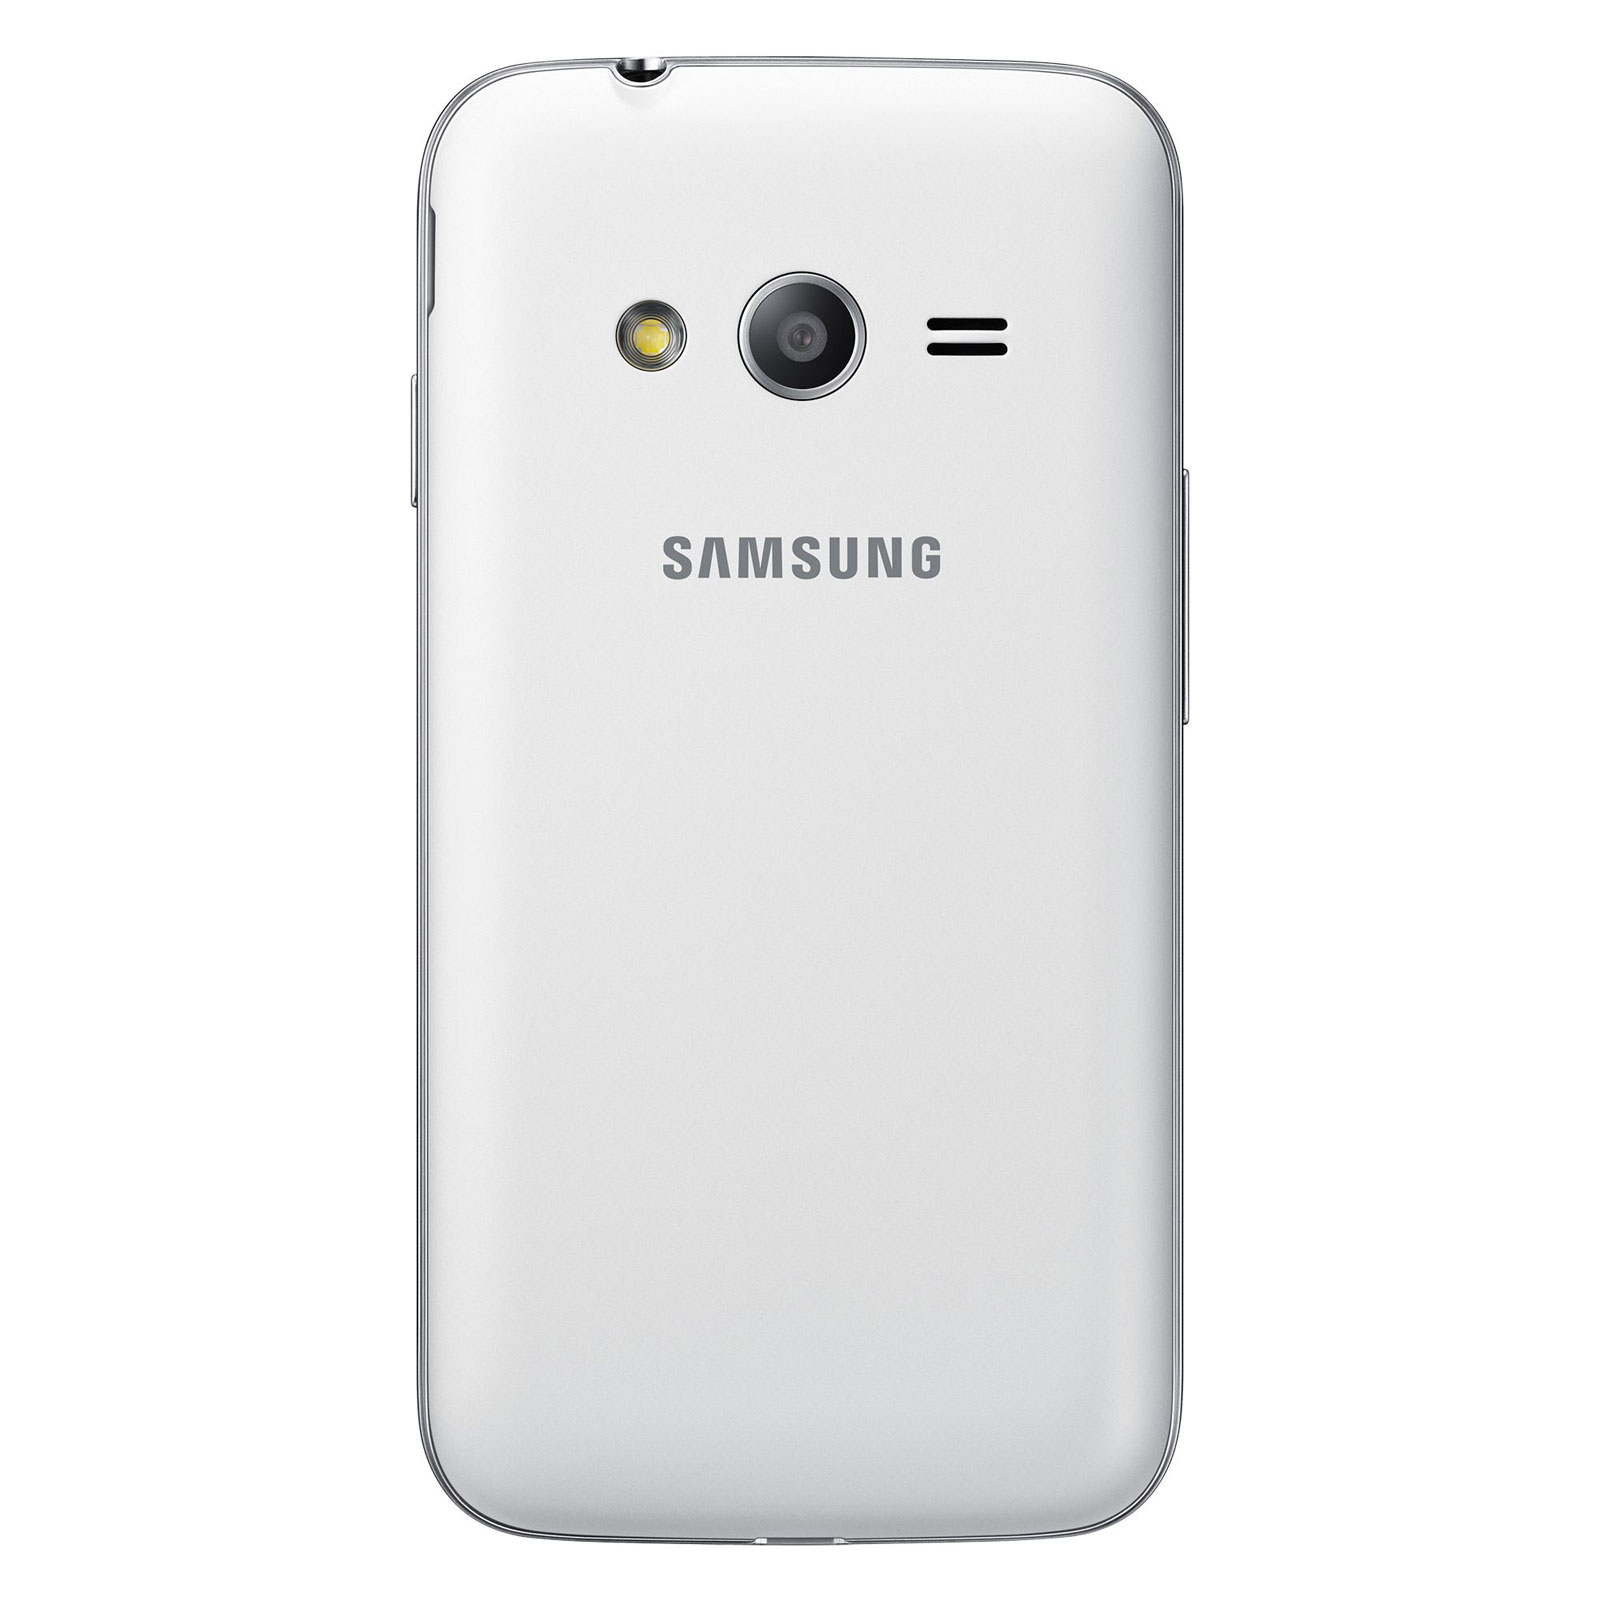 Samsung galaxy trend 2 lite sm g318 blanc mobile smartphone samsung sur ldlc - Telephone portable samsung galaxy trend lite ...